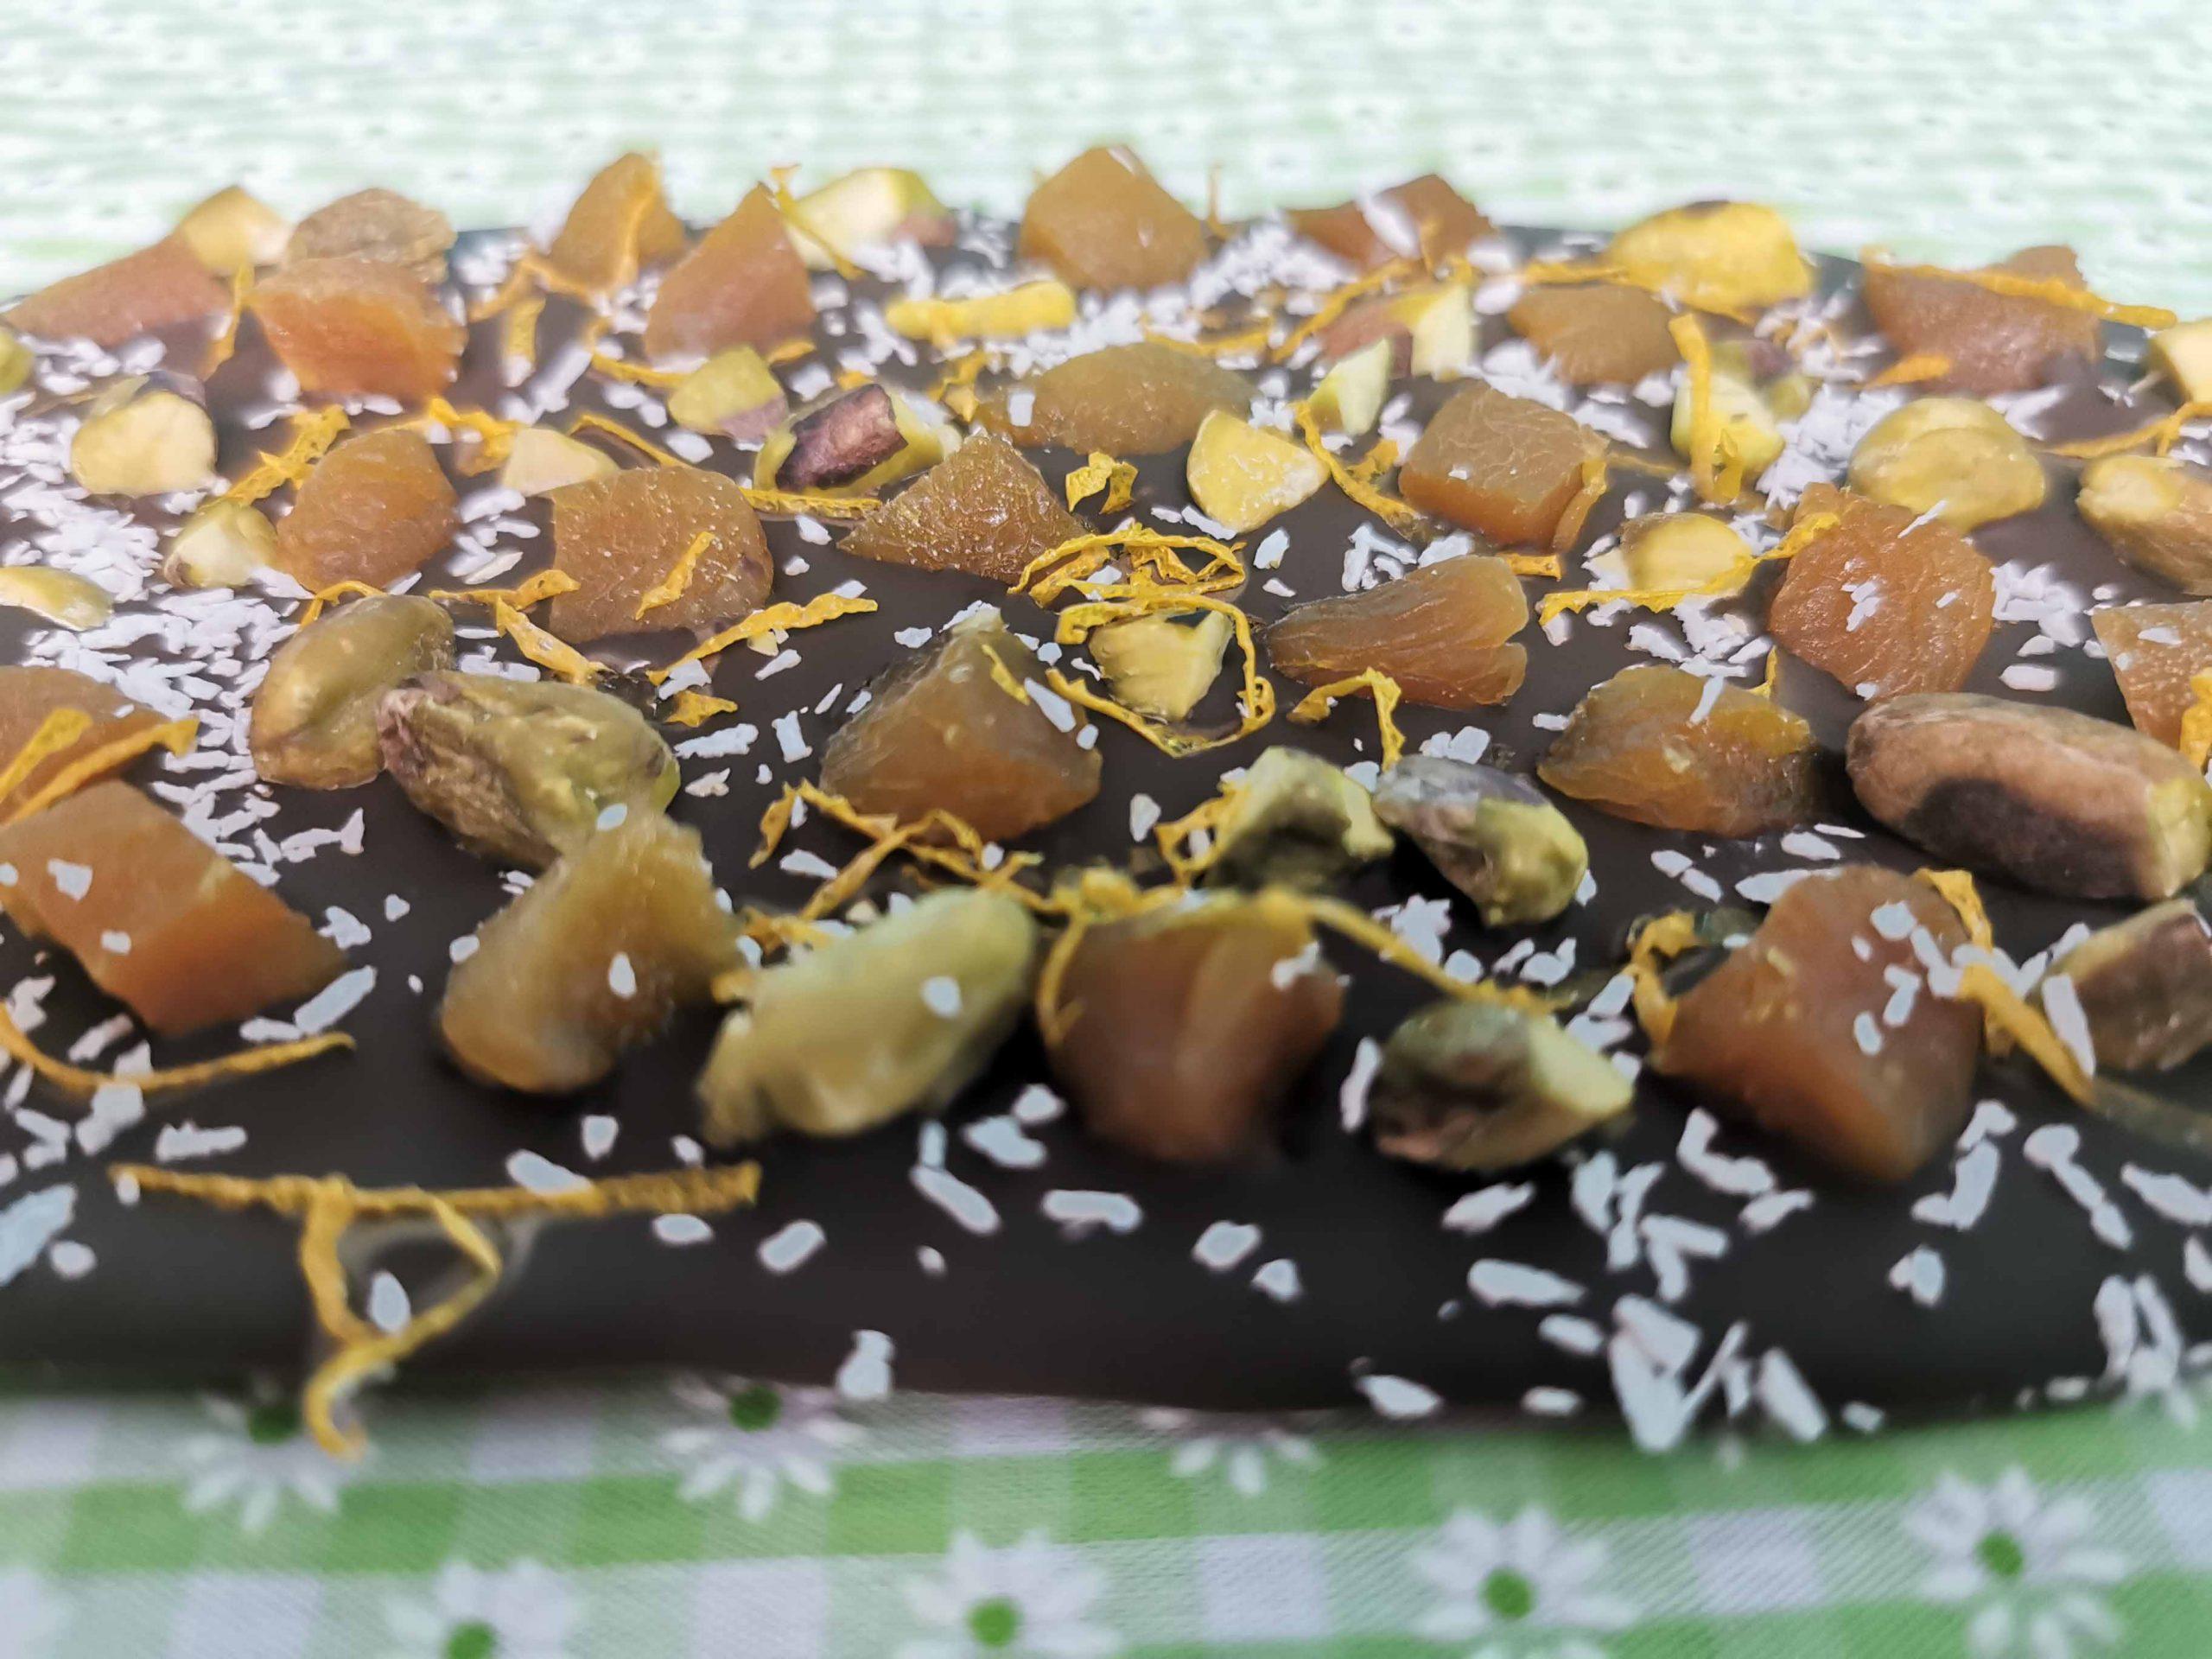 chocoreep met abrikozen en pistache